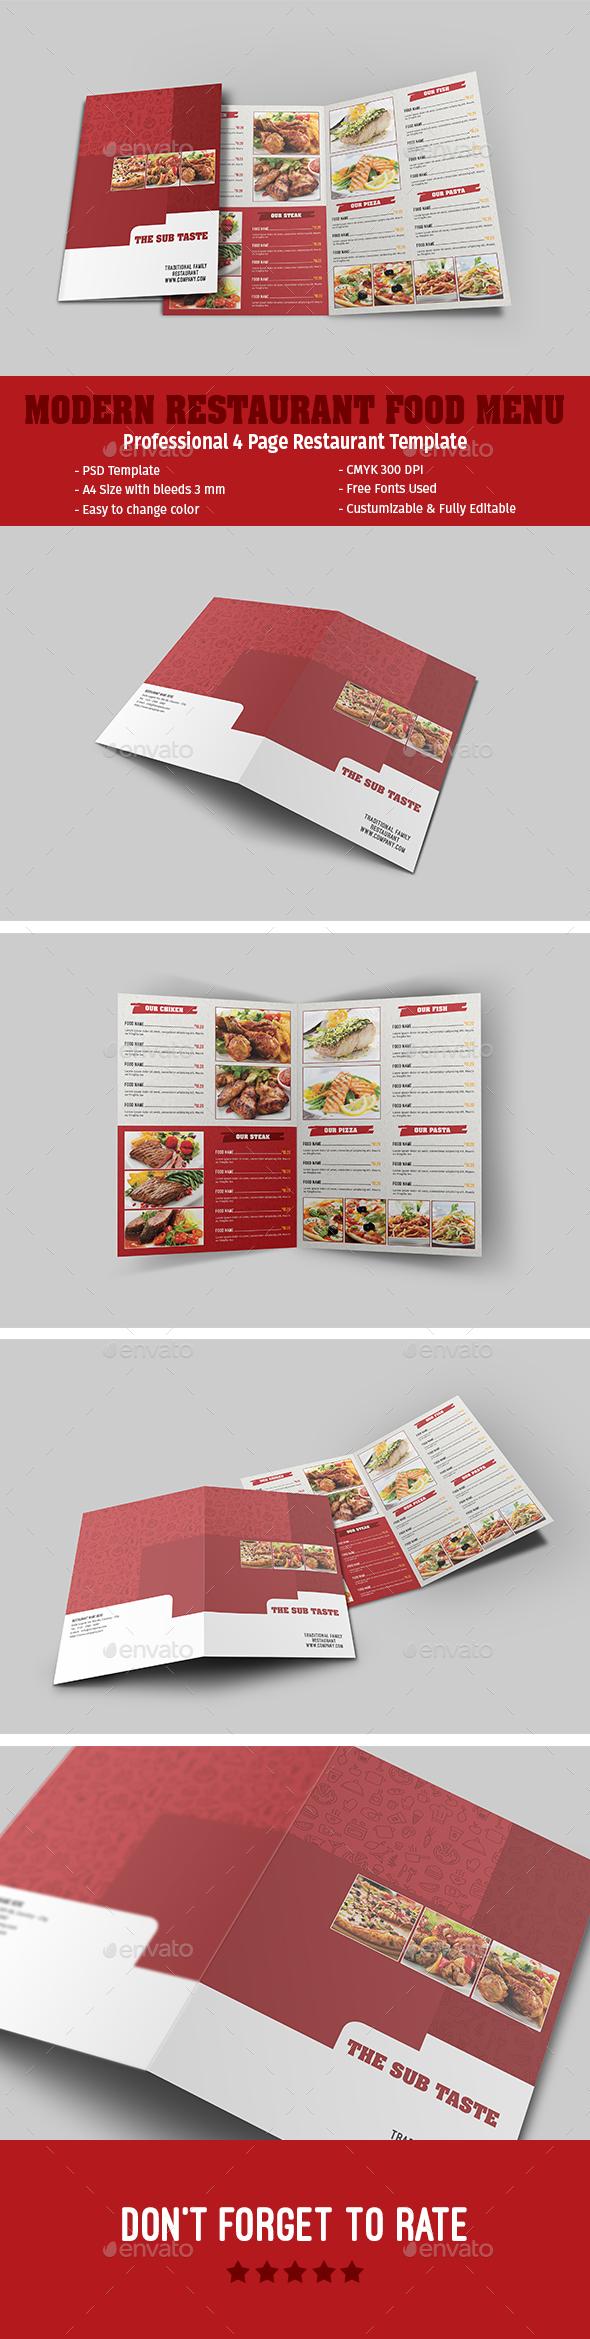 Modern Restaurant Food Menu - Food Menus Print Templates